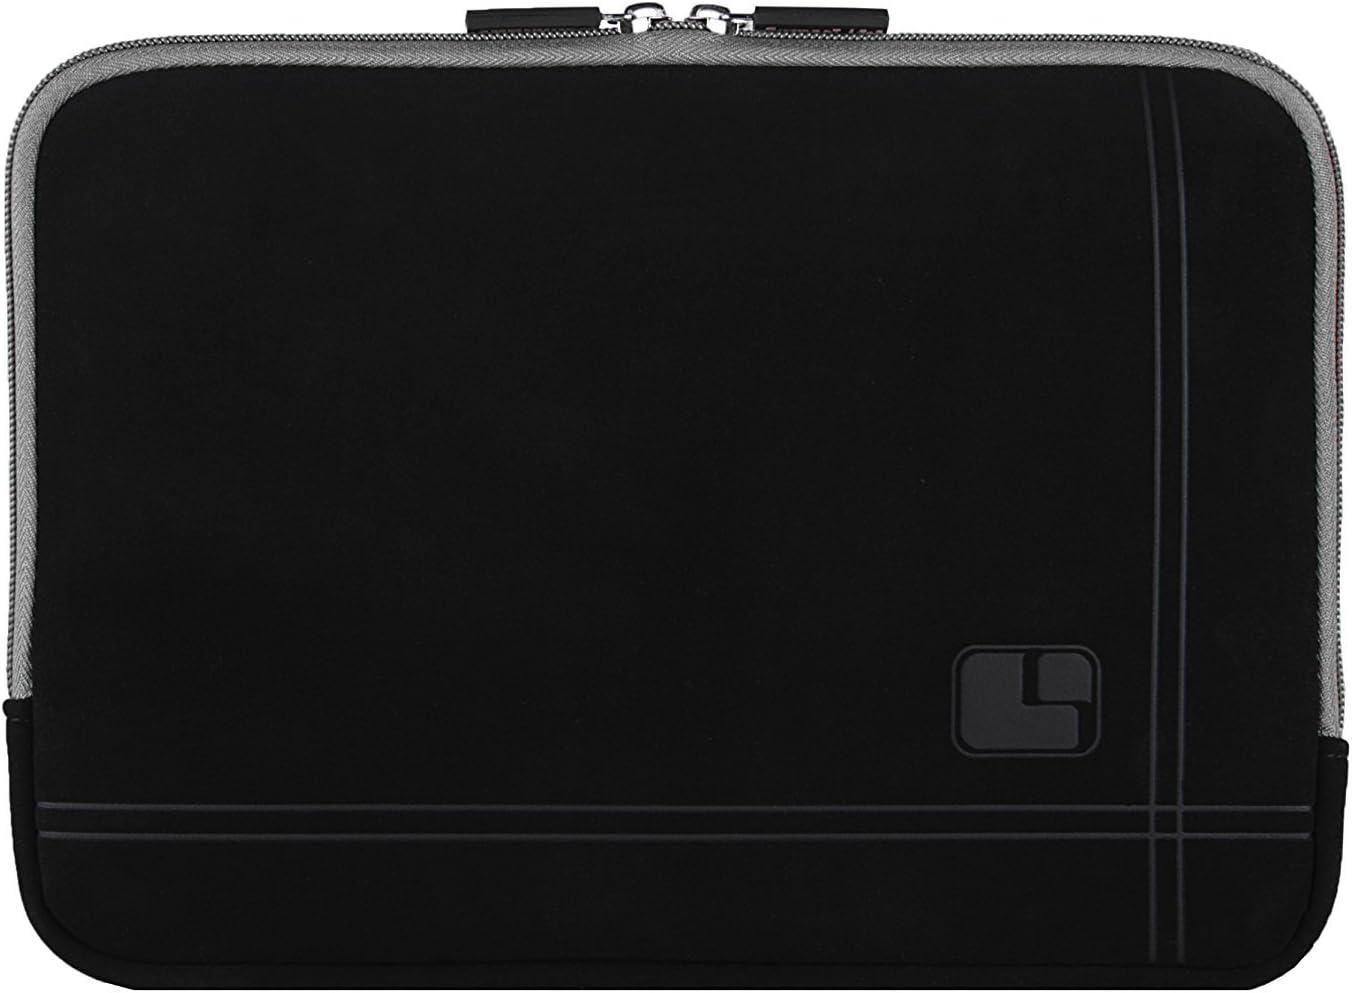 Laptop Case Fit Dell XPS 13 7390 9380 Dell Inspiron 13 7000 Dell Latitude 13